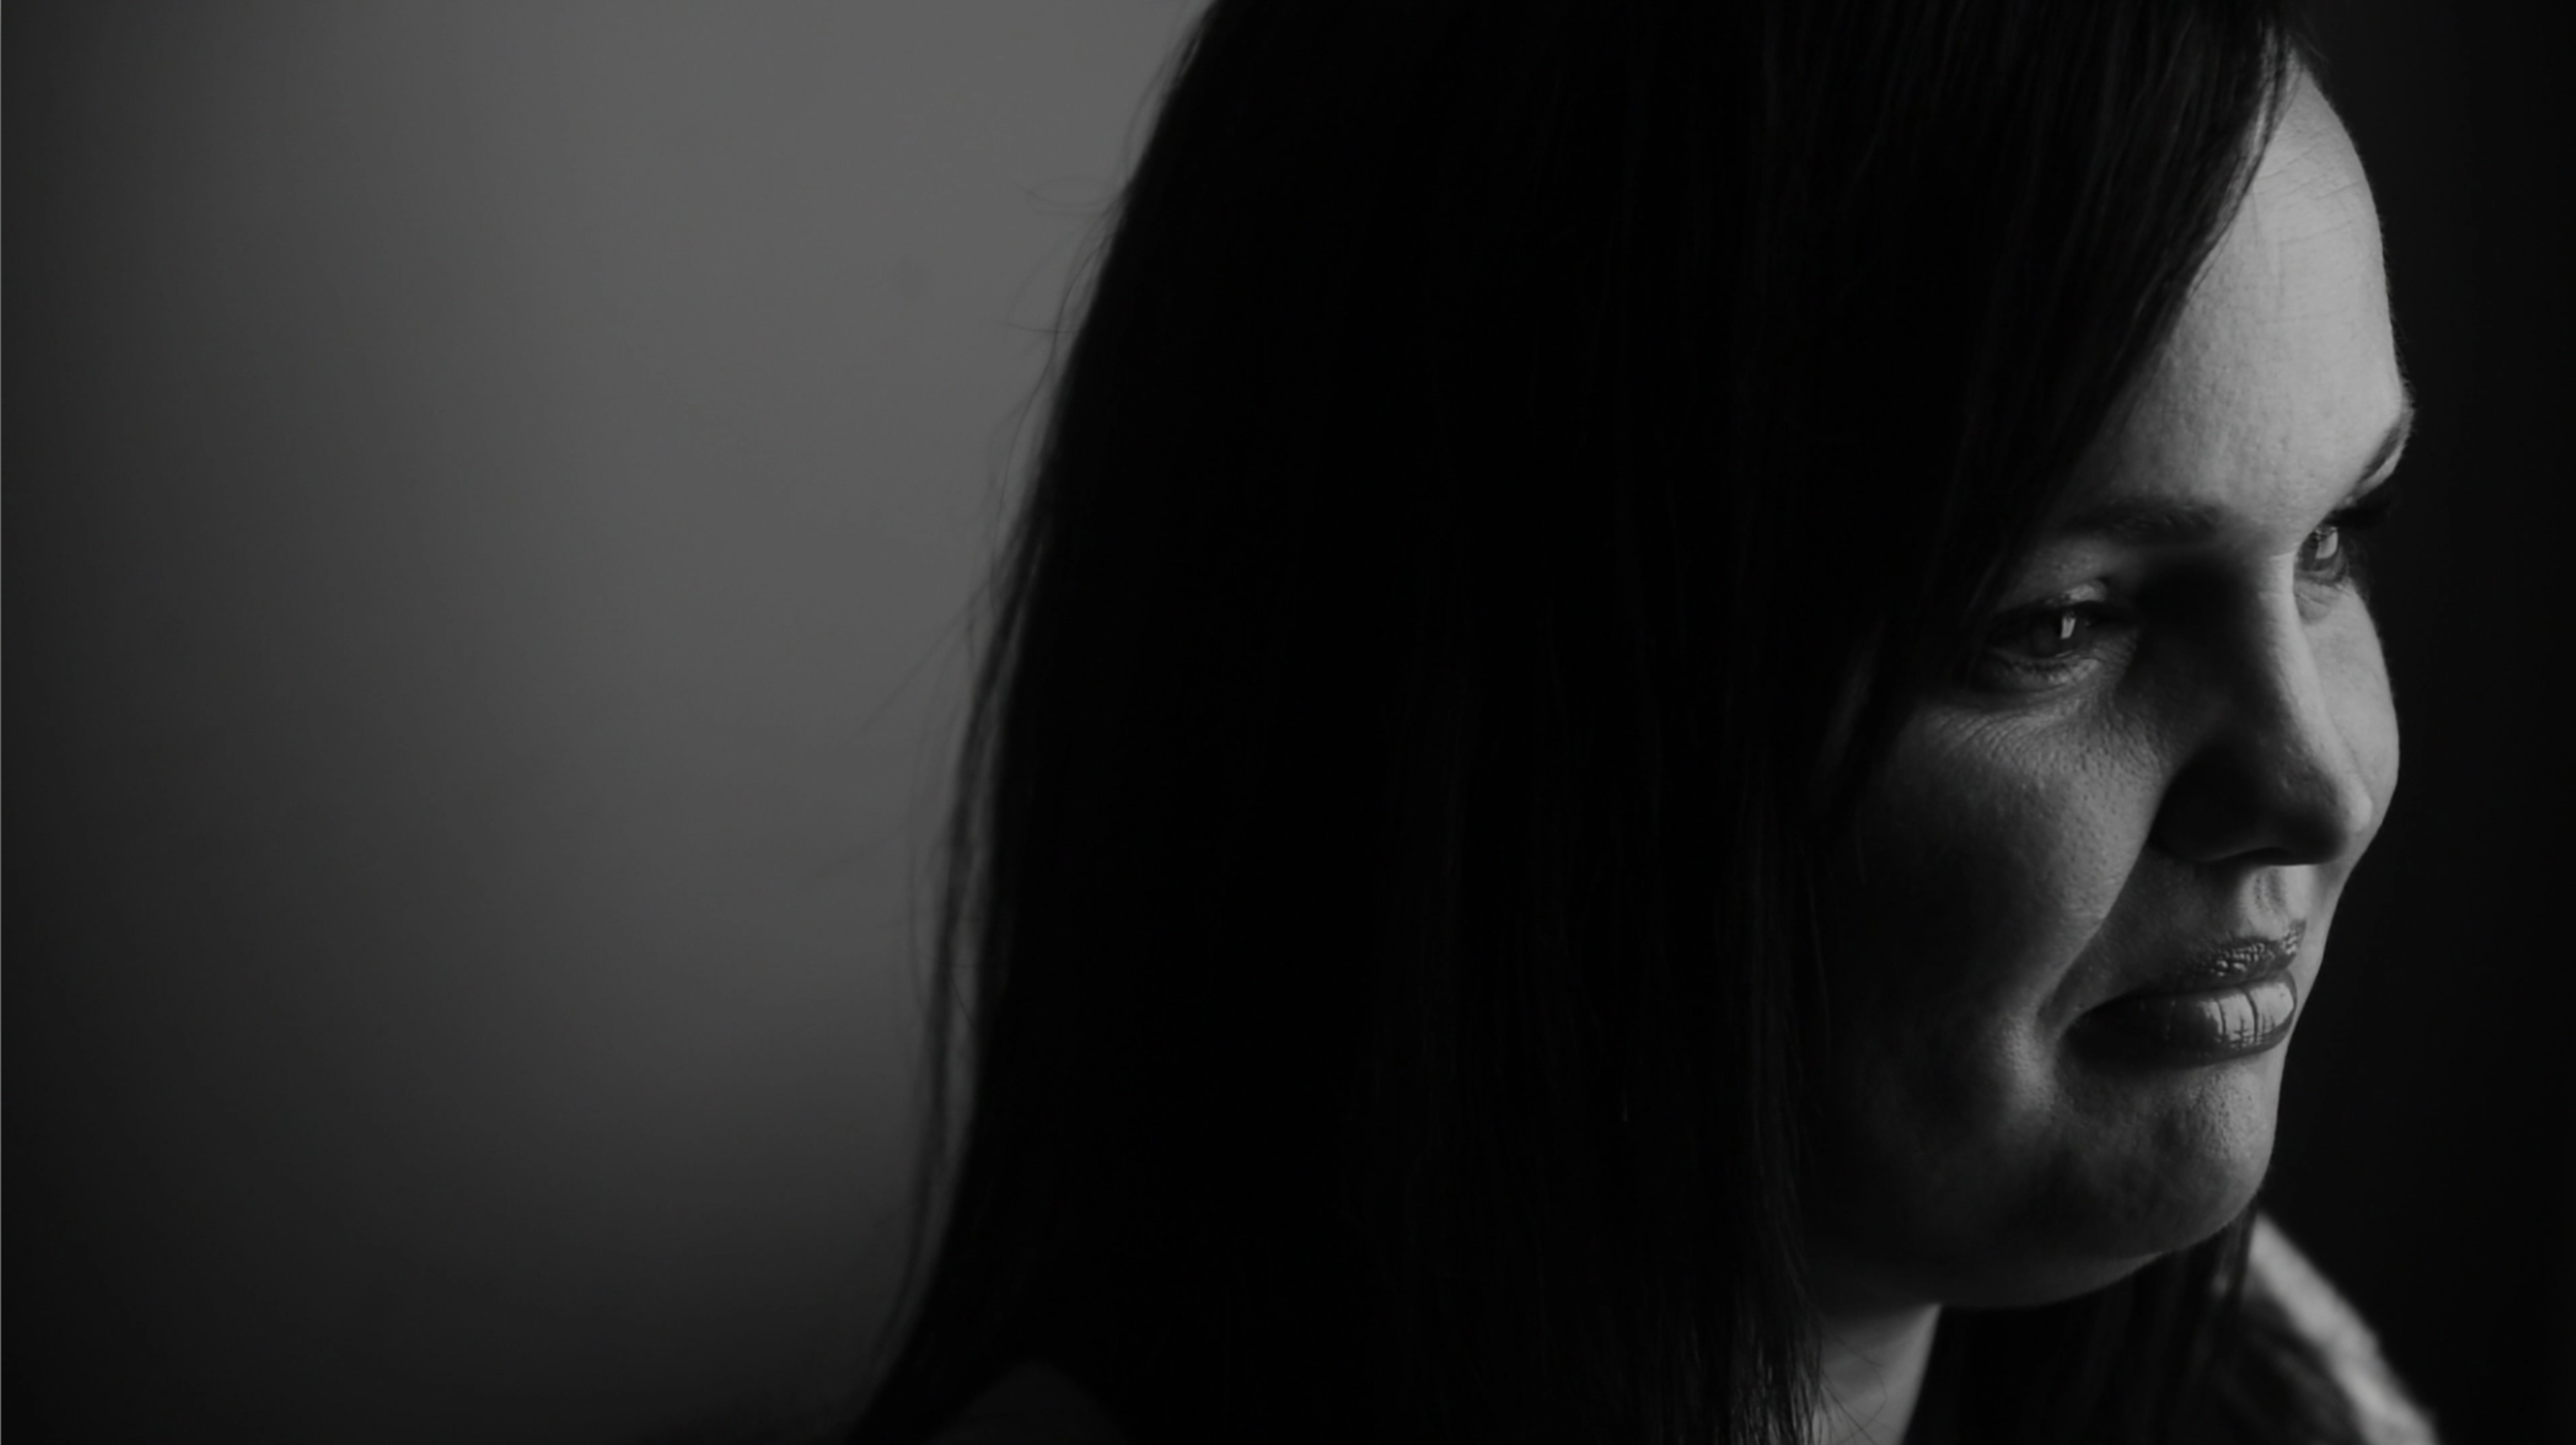 """My Favorite Moment"" – A Video Portrait by Melissa Parrish"